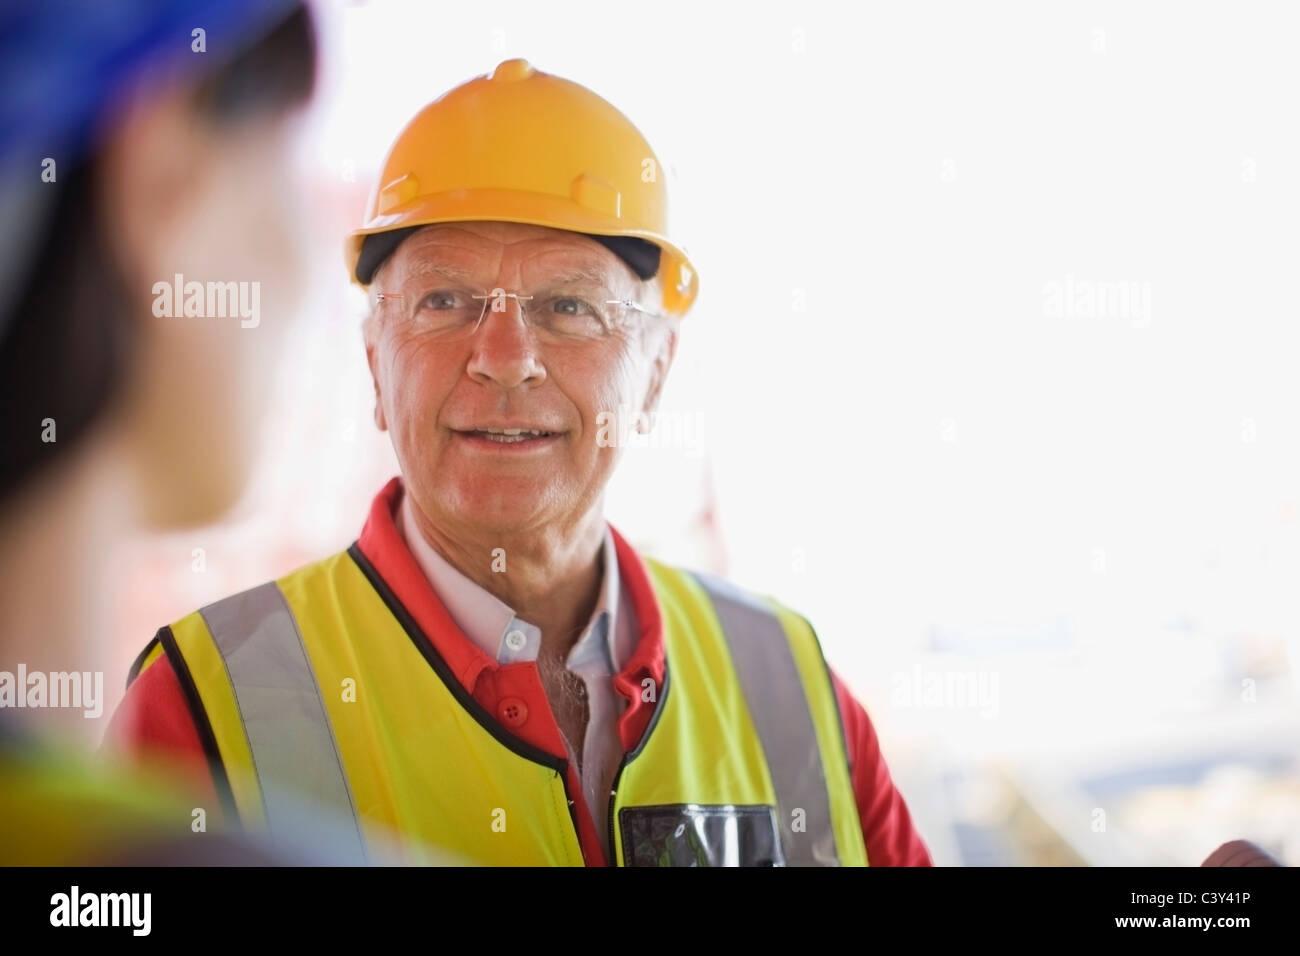 Portrait of a builder - Stock Image